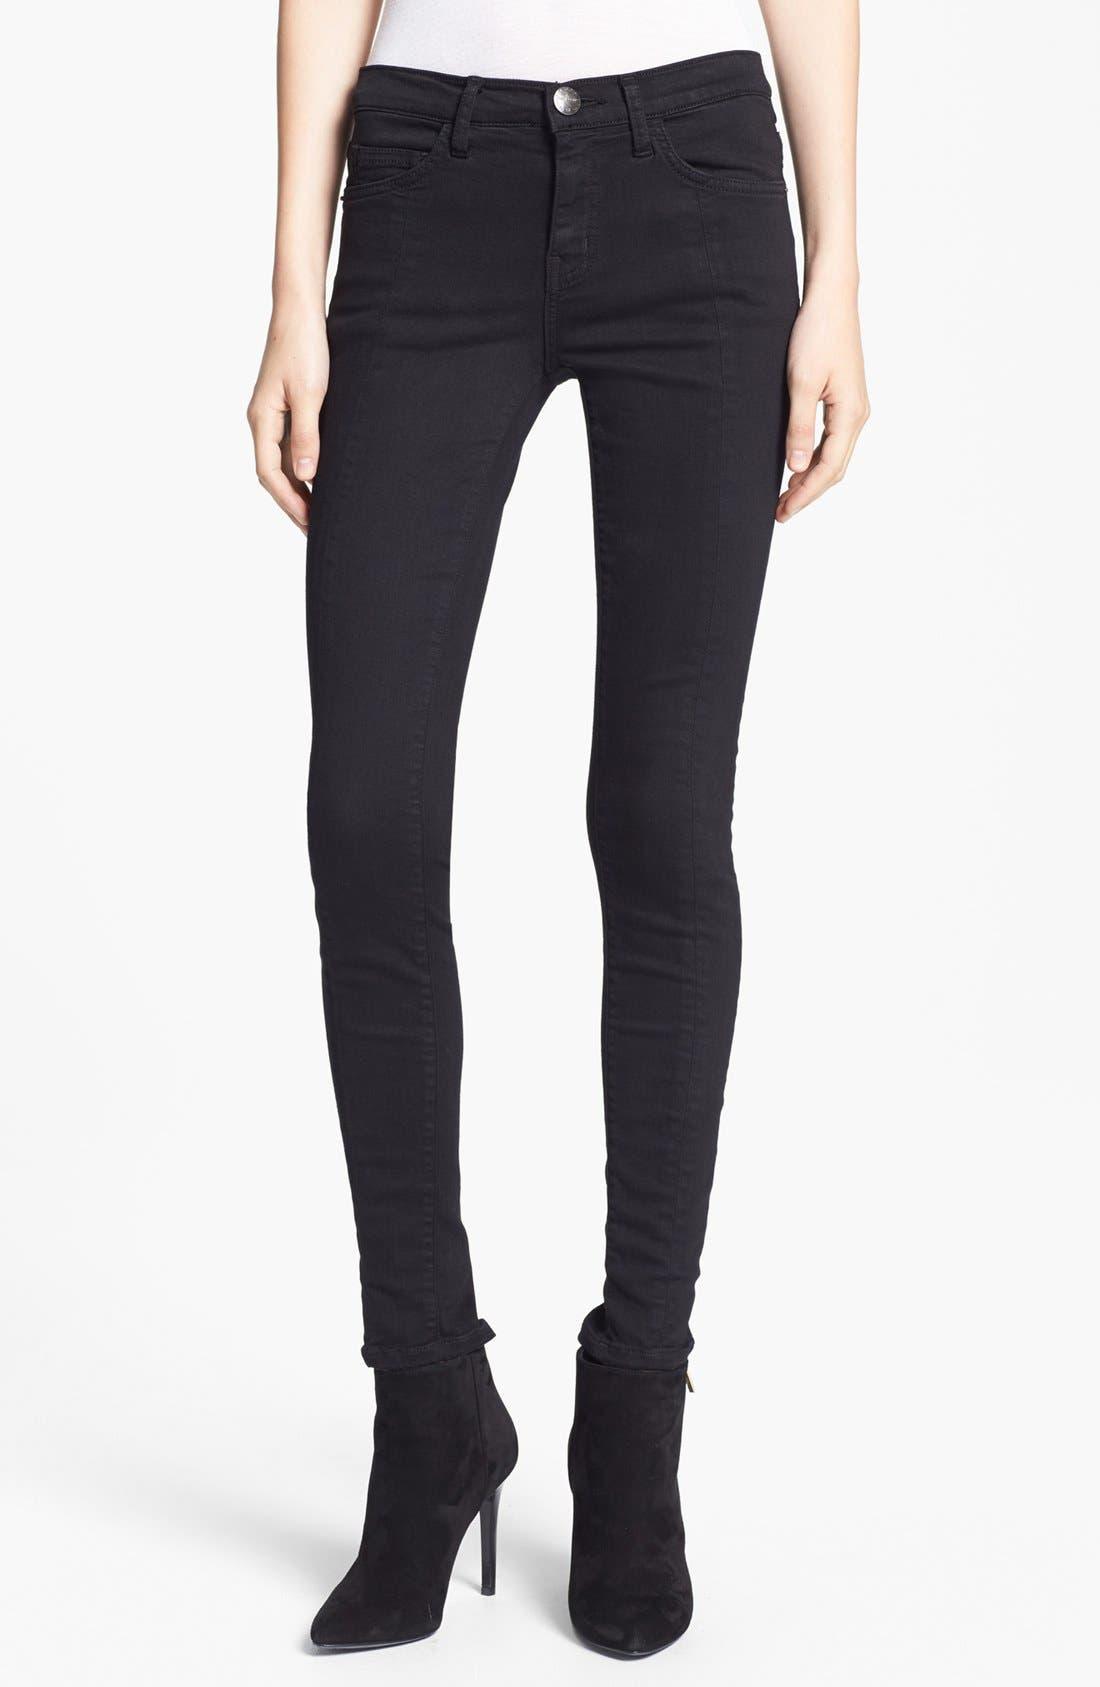 Main Image - Current/Elliott 'The Ankle Seamstress' Skinny Jeans (Jet Black)